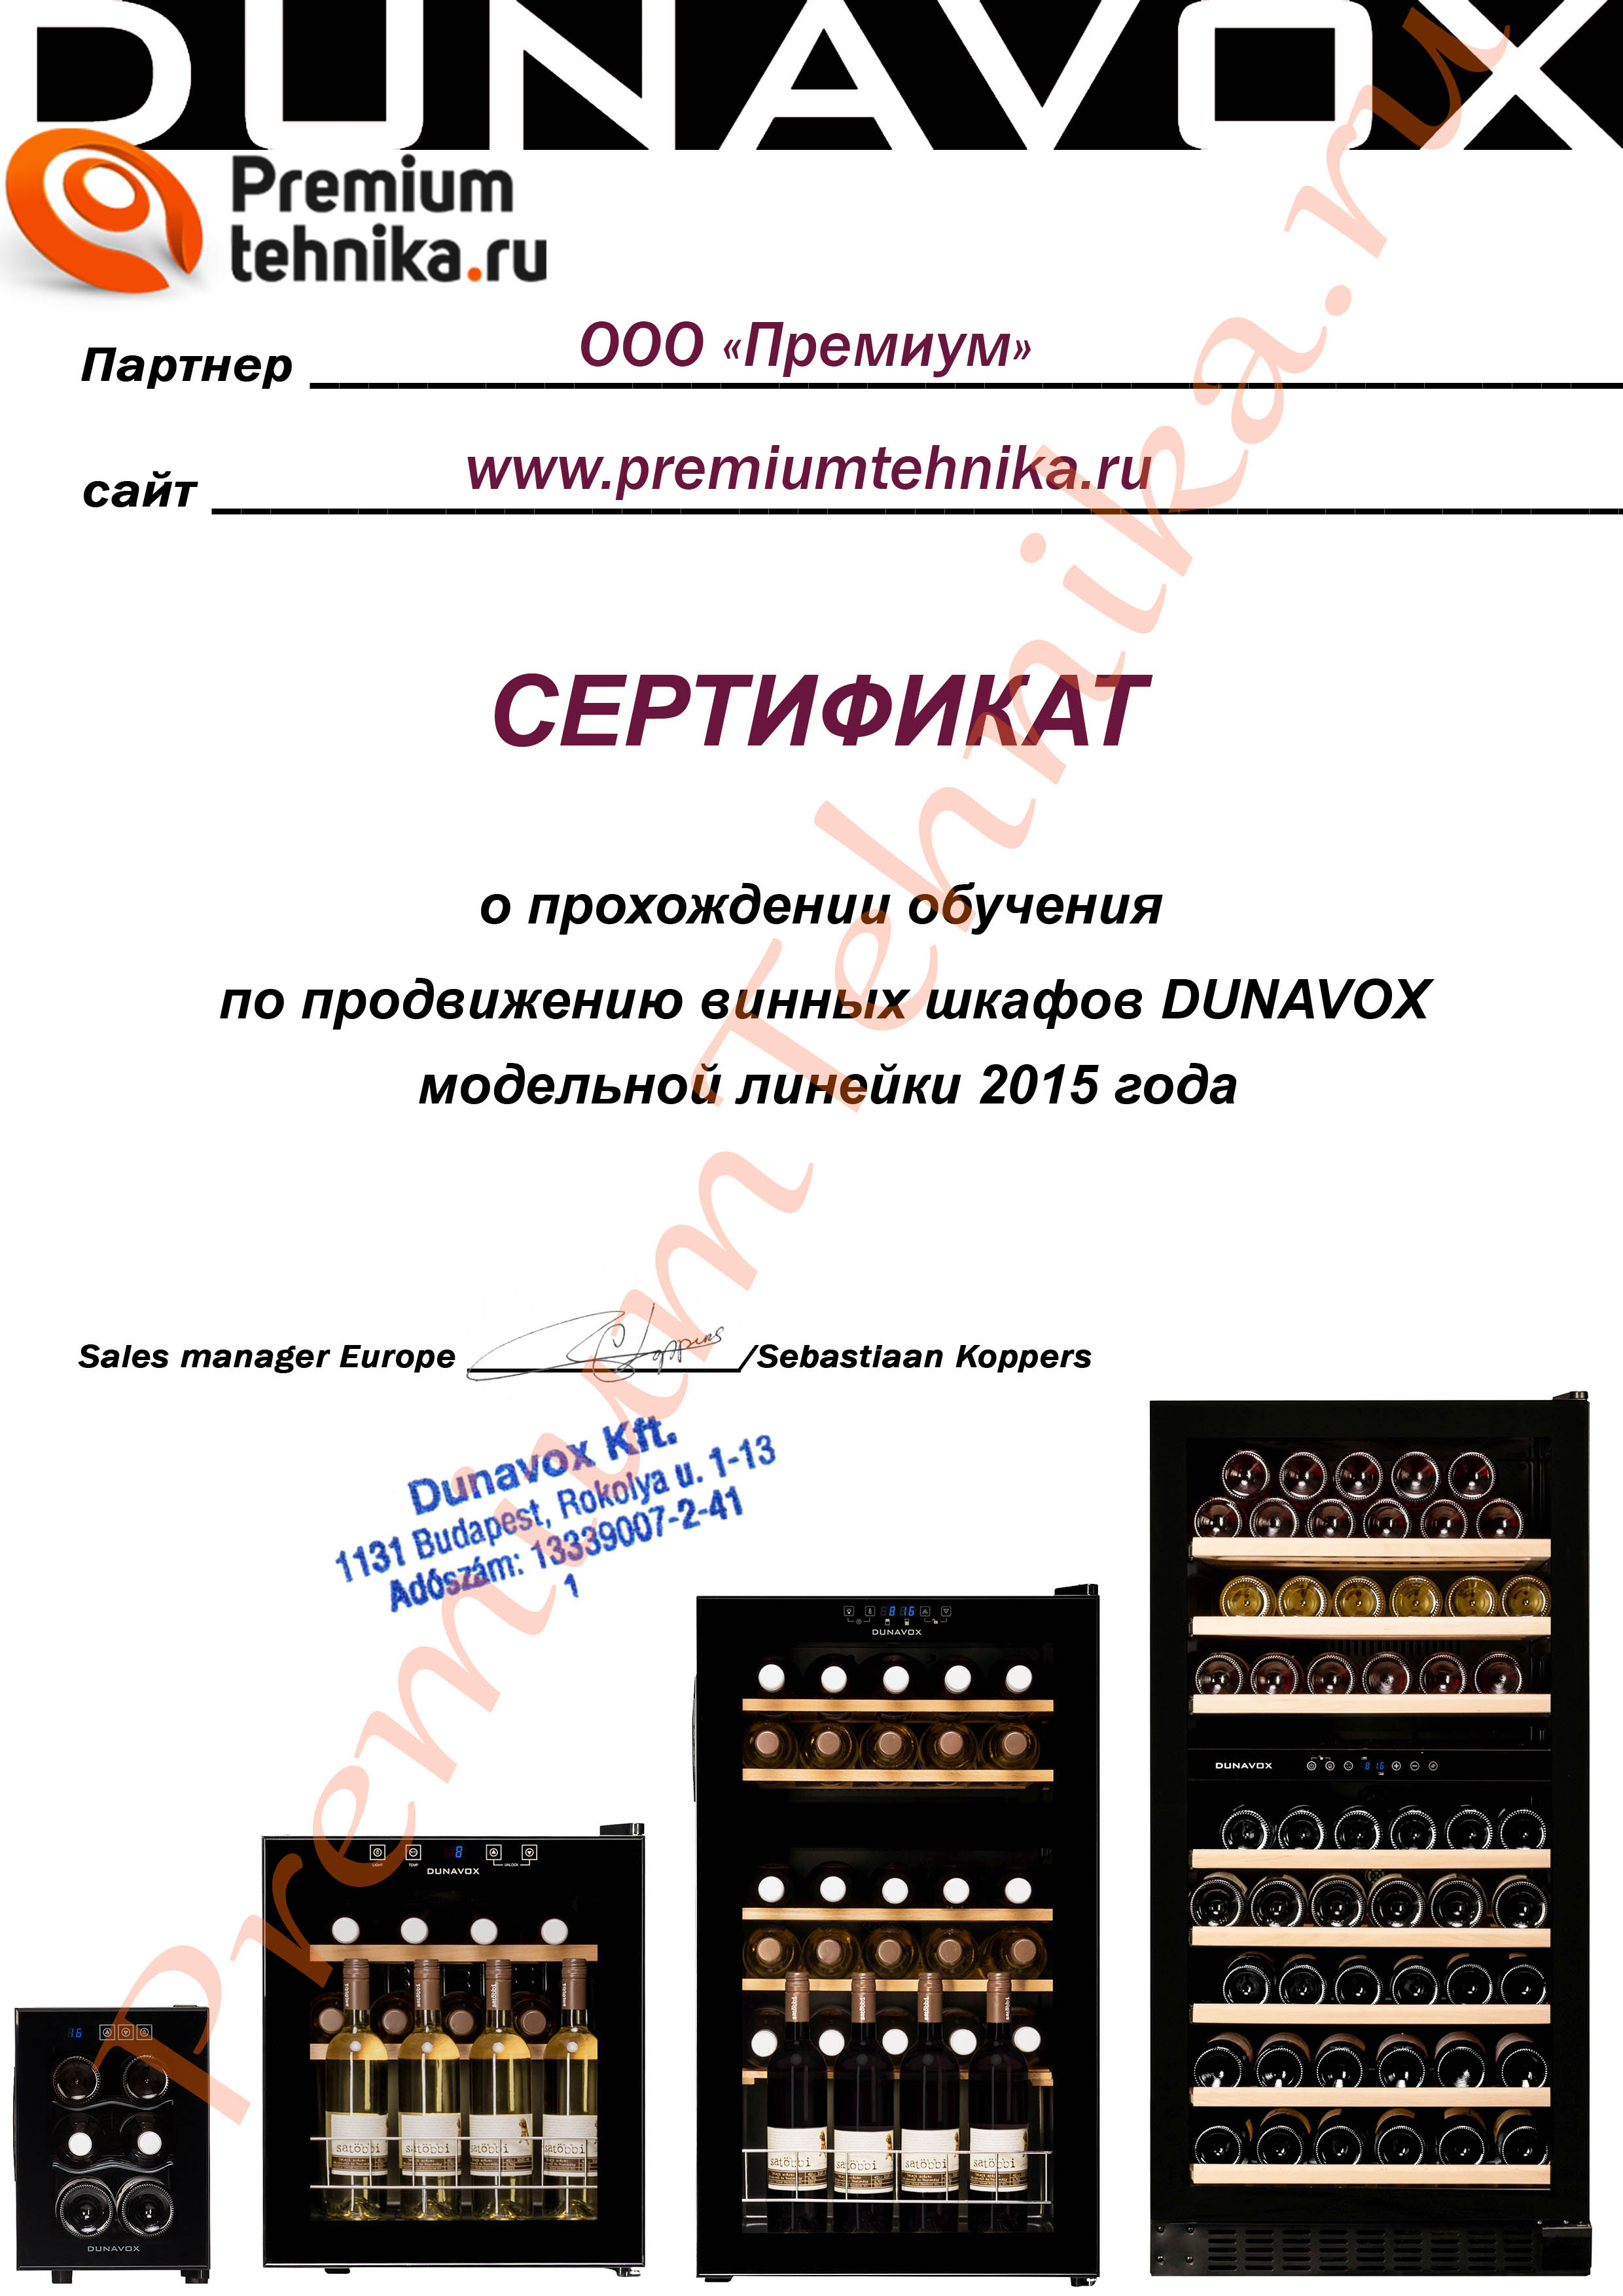 Sertifikat_Dunavox.jpg